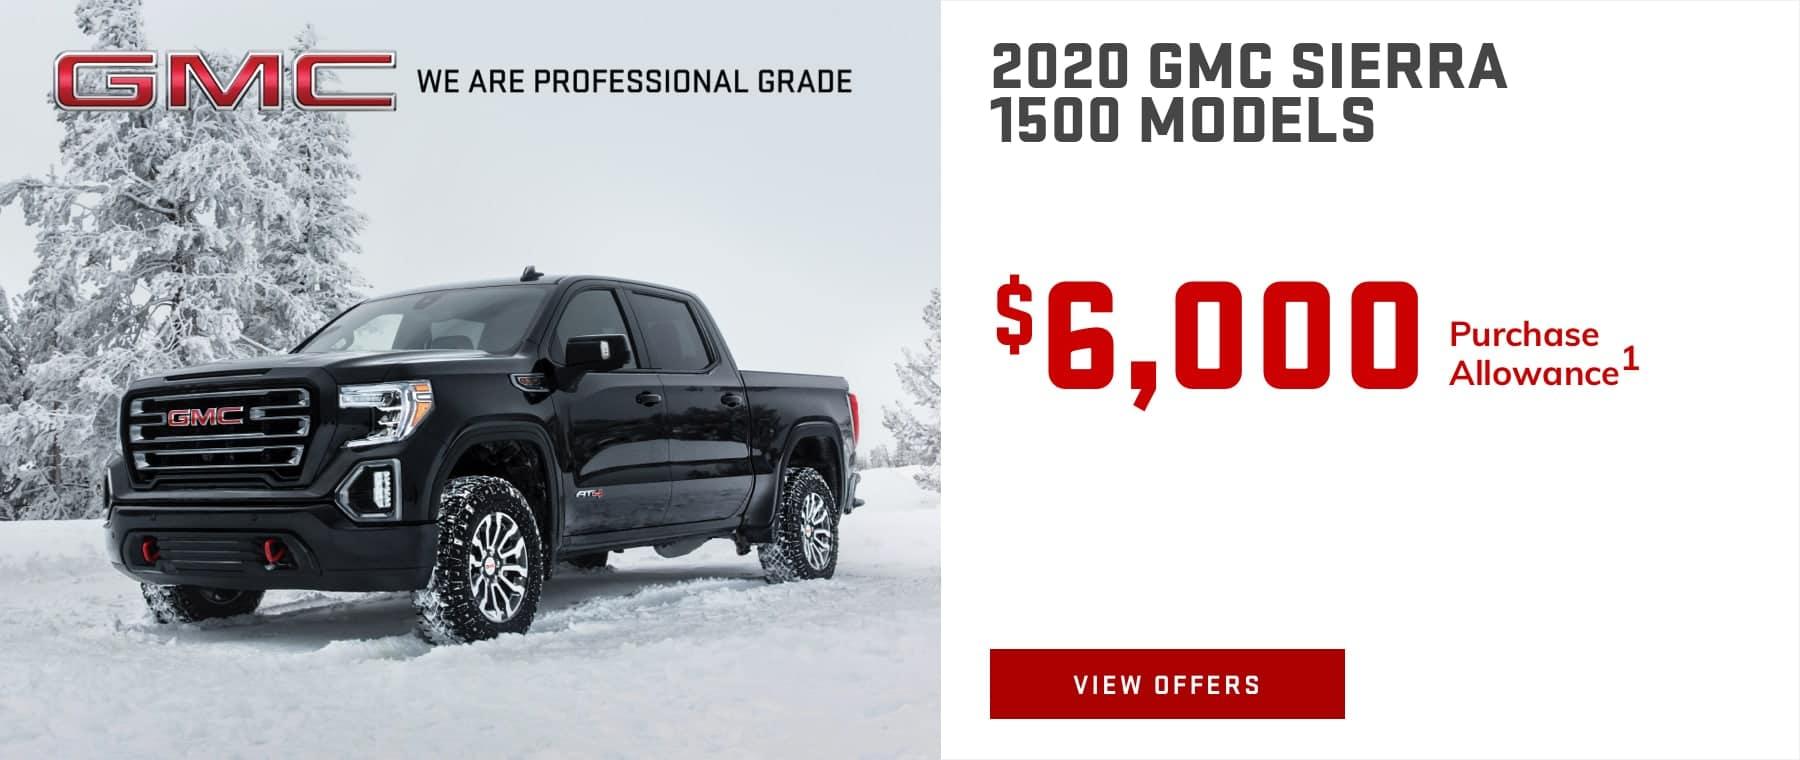 MOST 2020 GMC SIERRA 1500 CREW CAB MODELS - $6,000 Purchase Allowance1